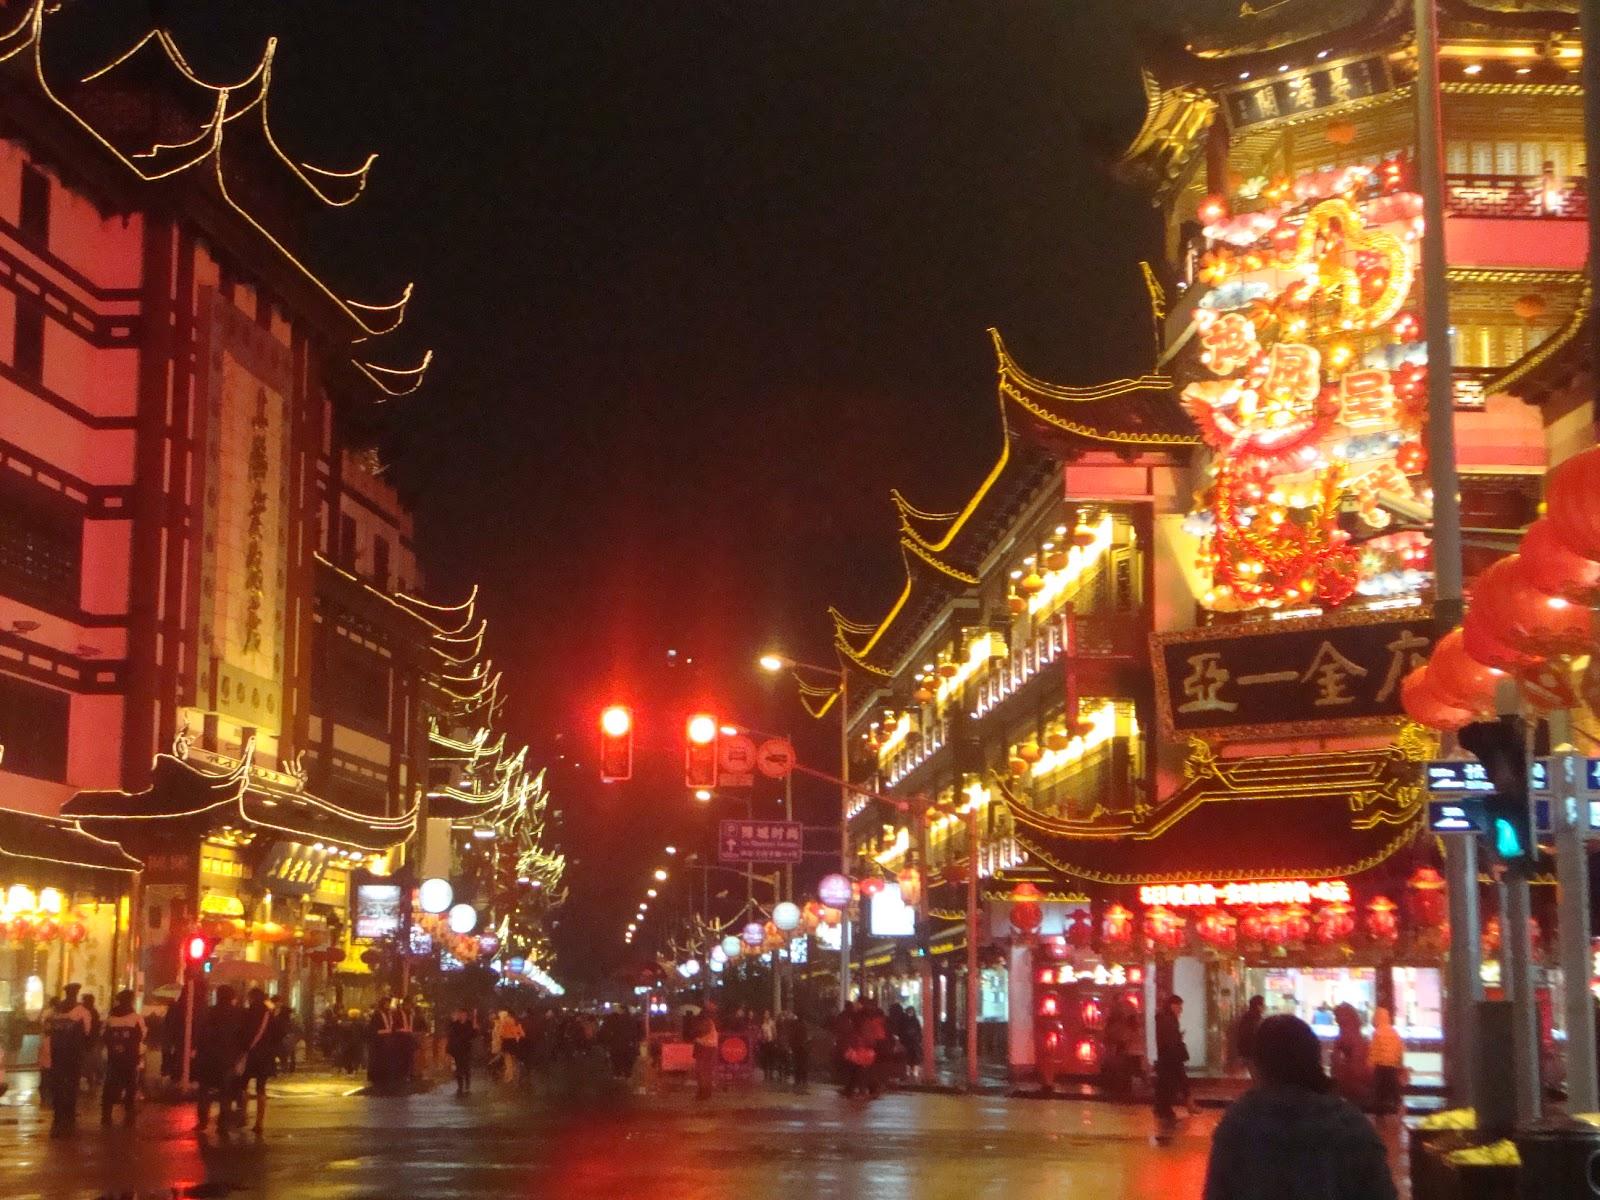 L 39 architecture chinoise lial agadir le carrefour des for Architecture chinoise